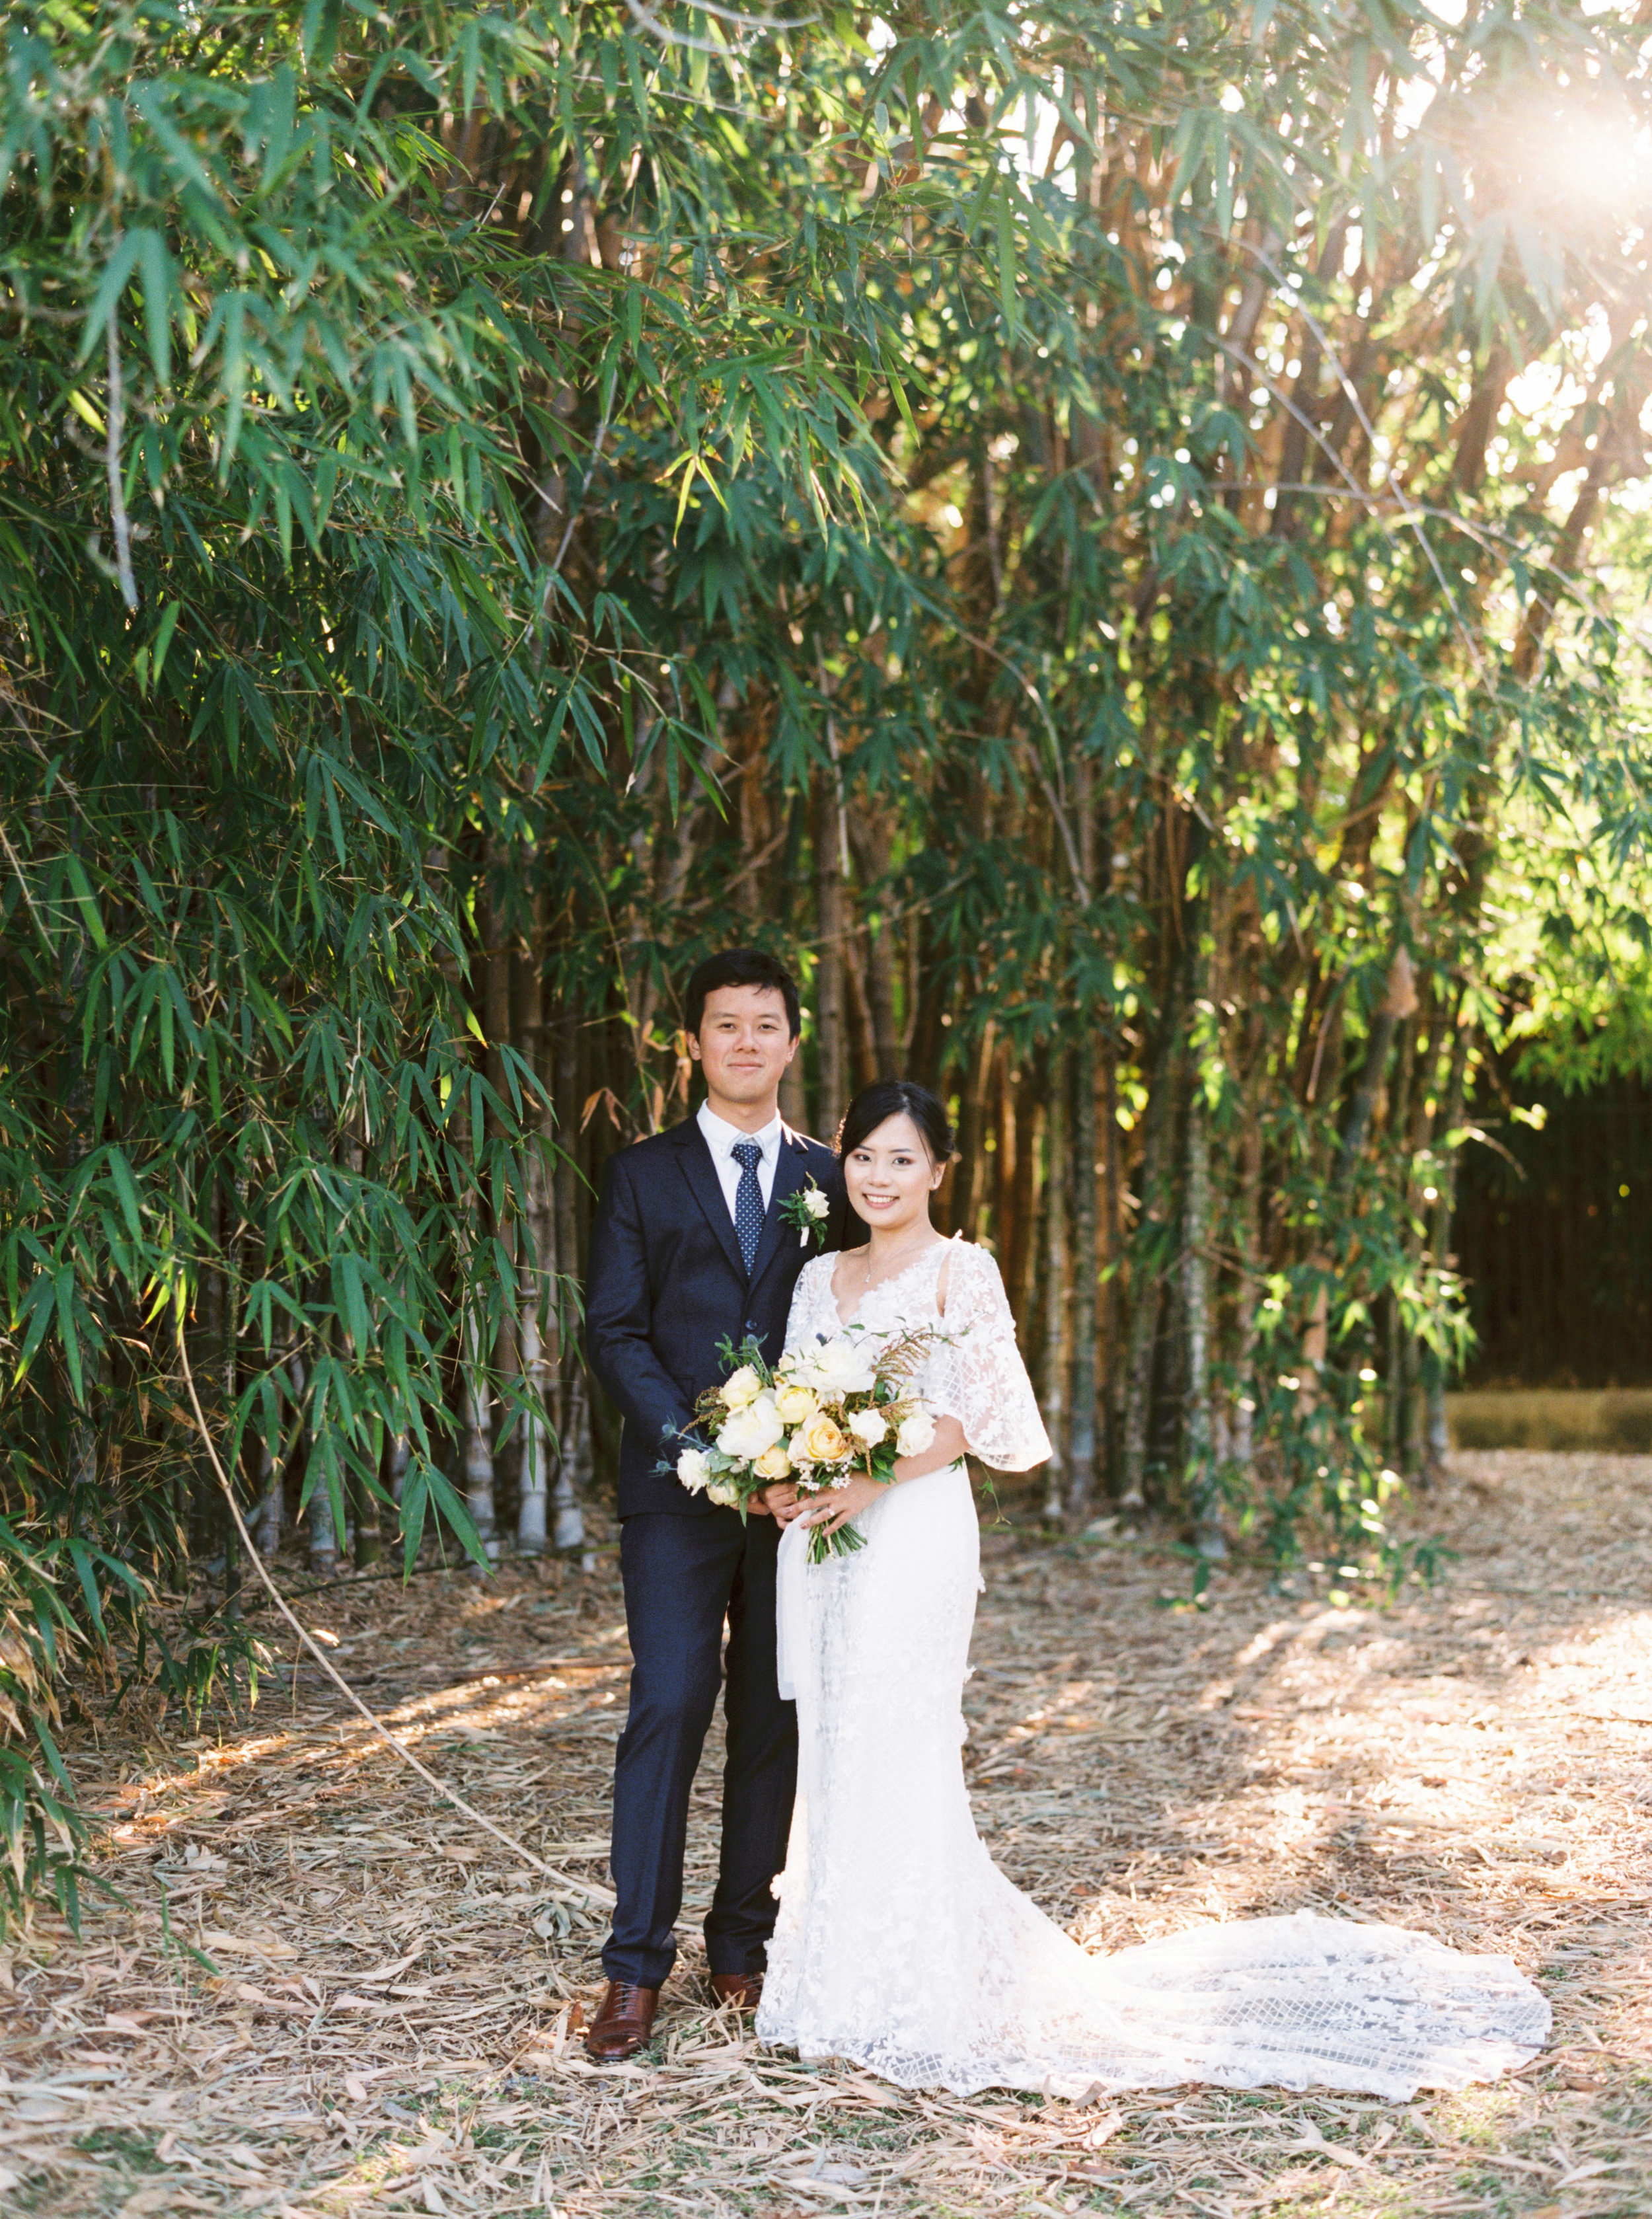 00019- Australia Sydney Wedding Photographer Sheri McMahon.jpg